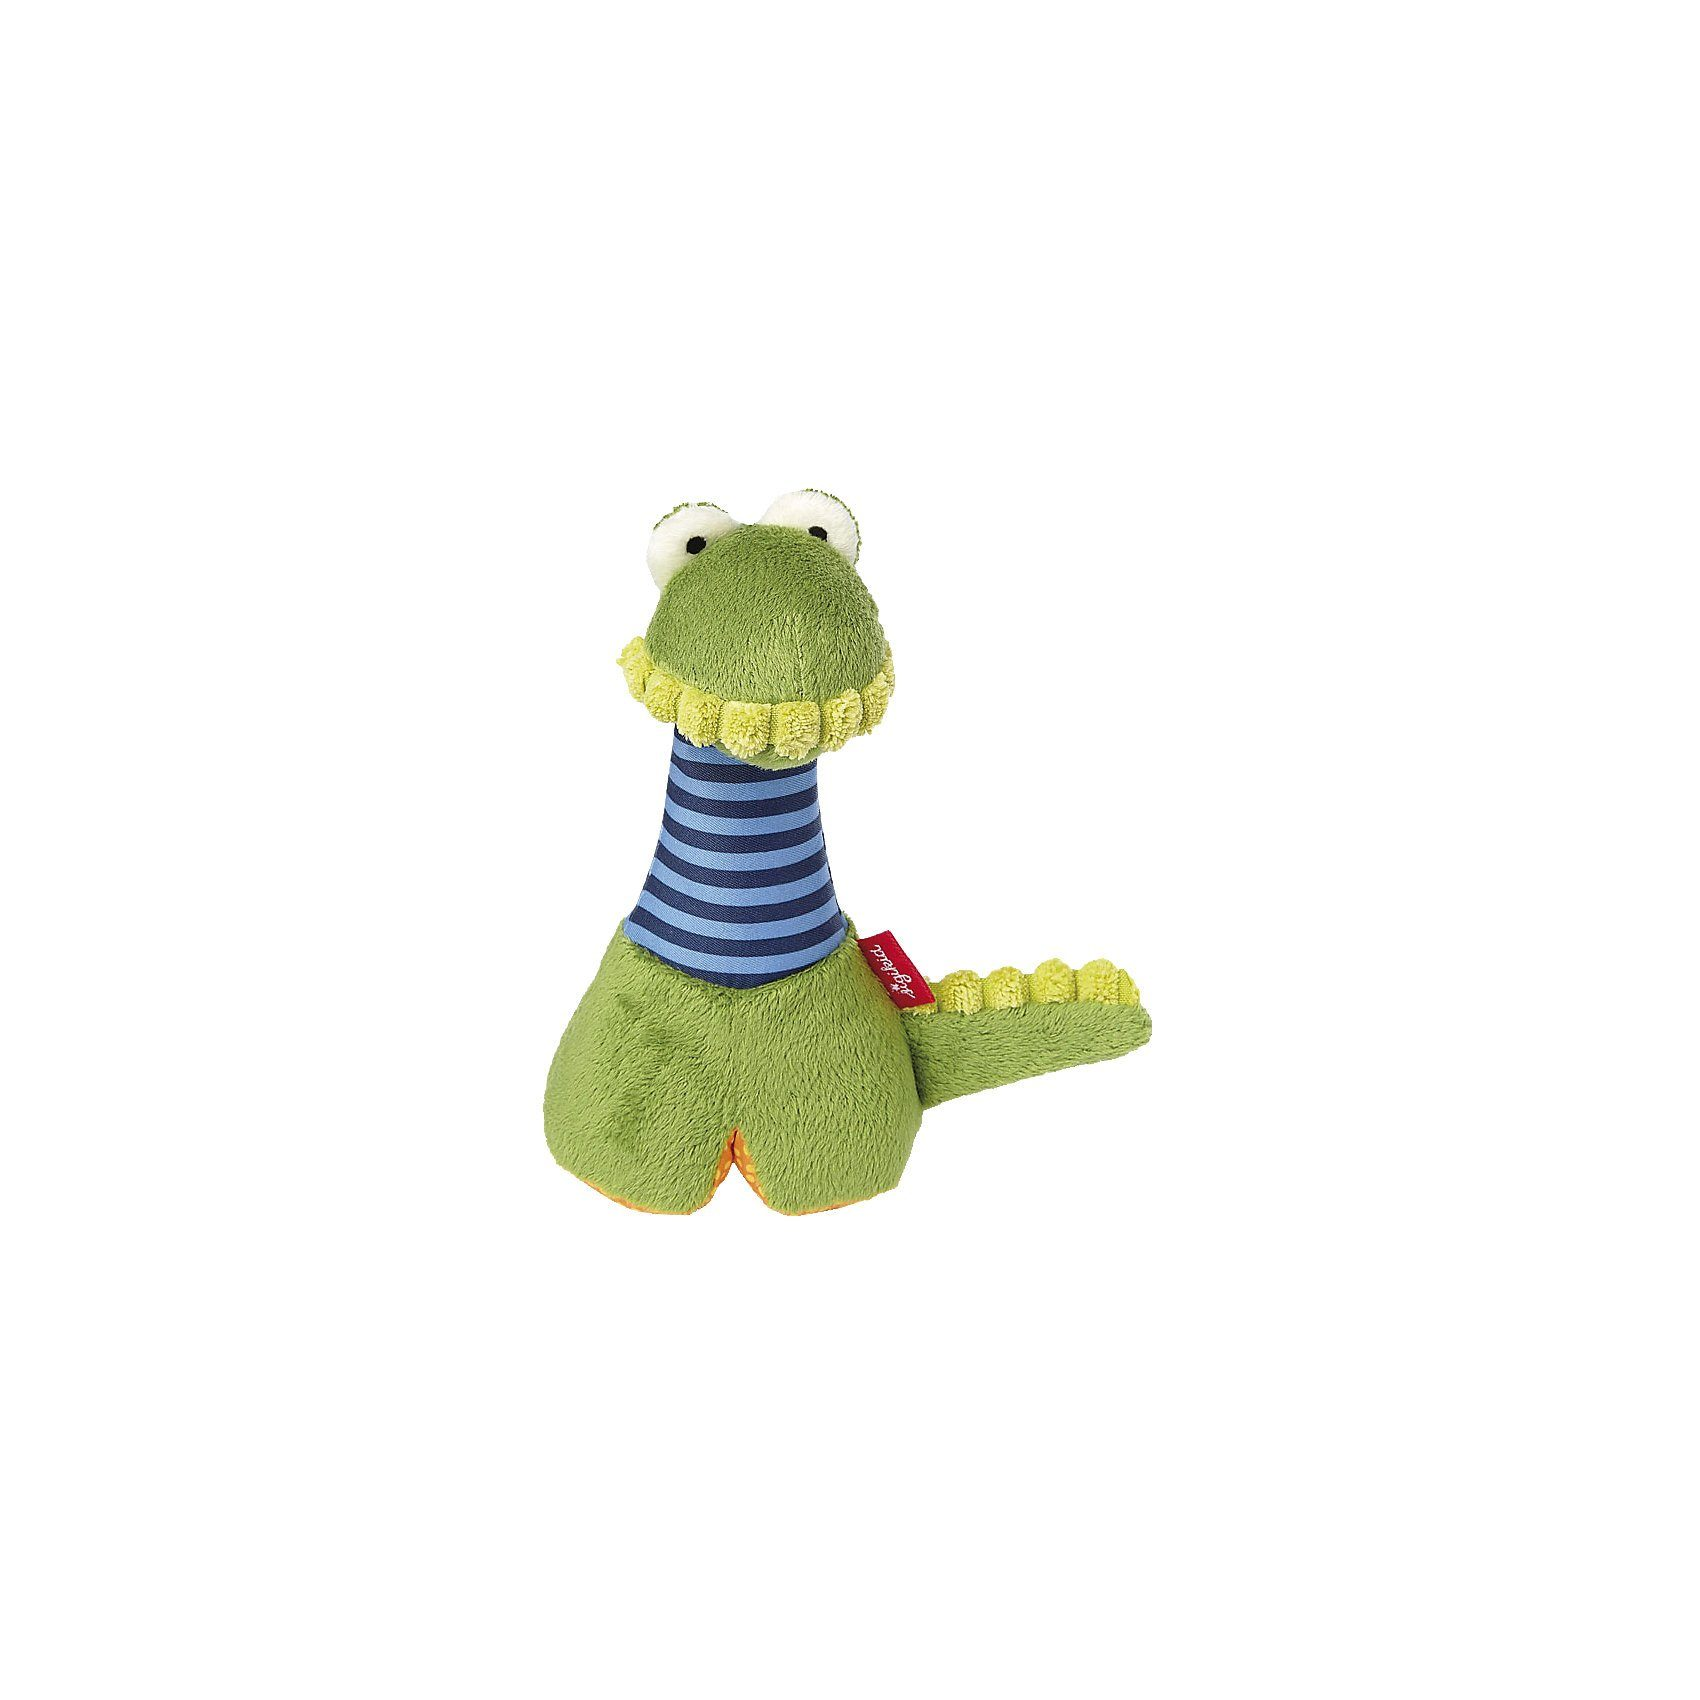 sigikid Stabrassel Krokodil